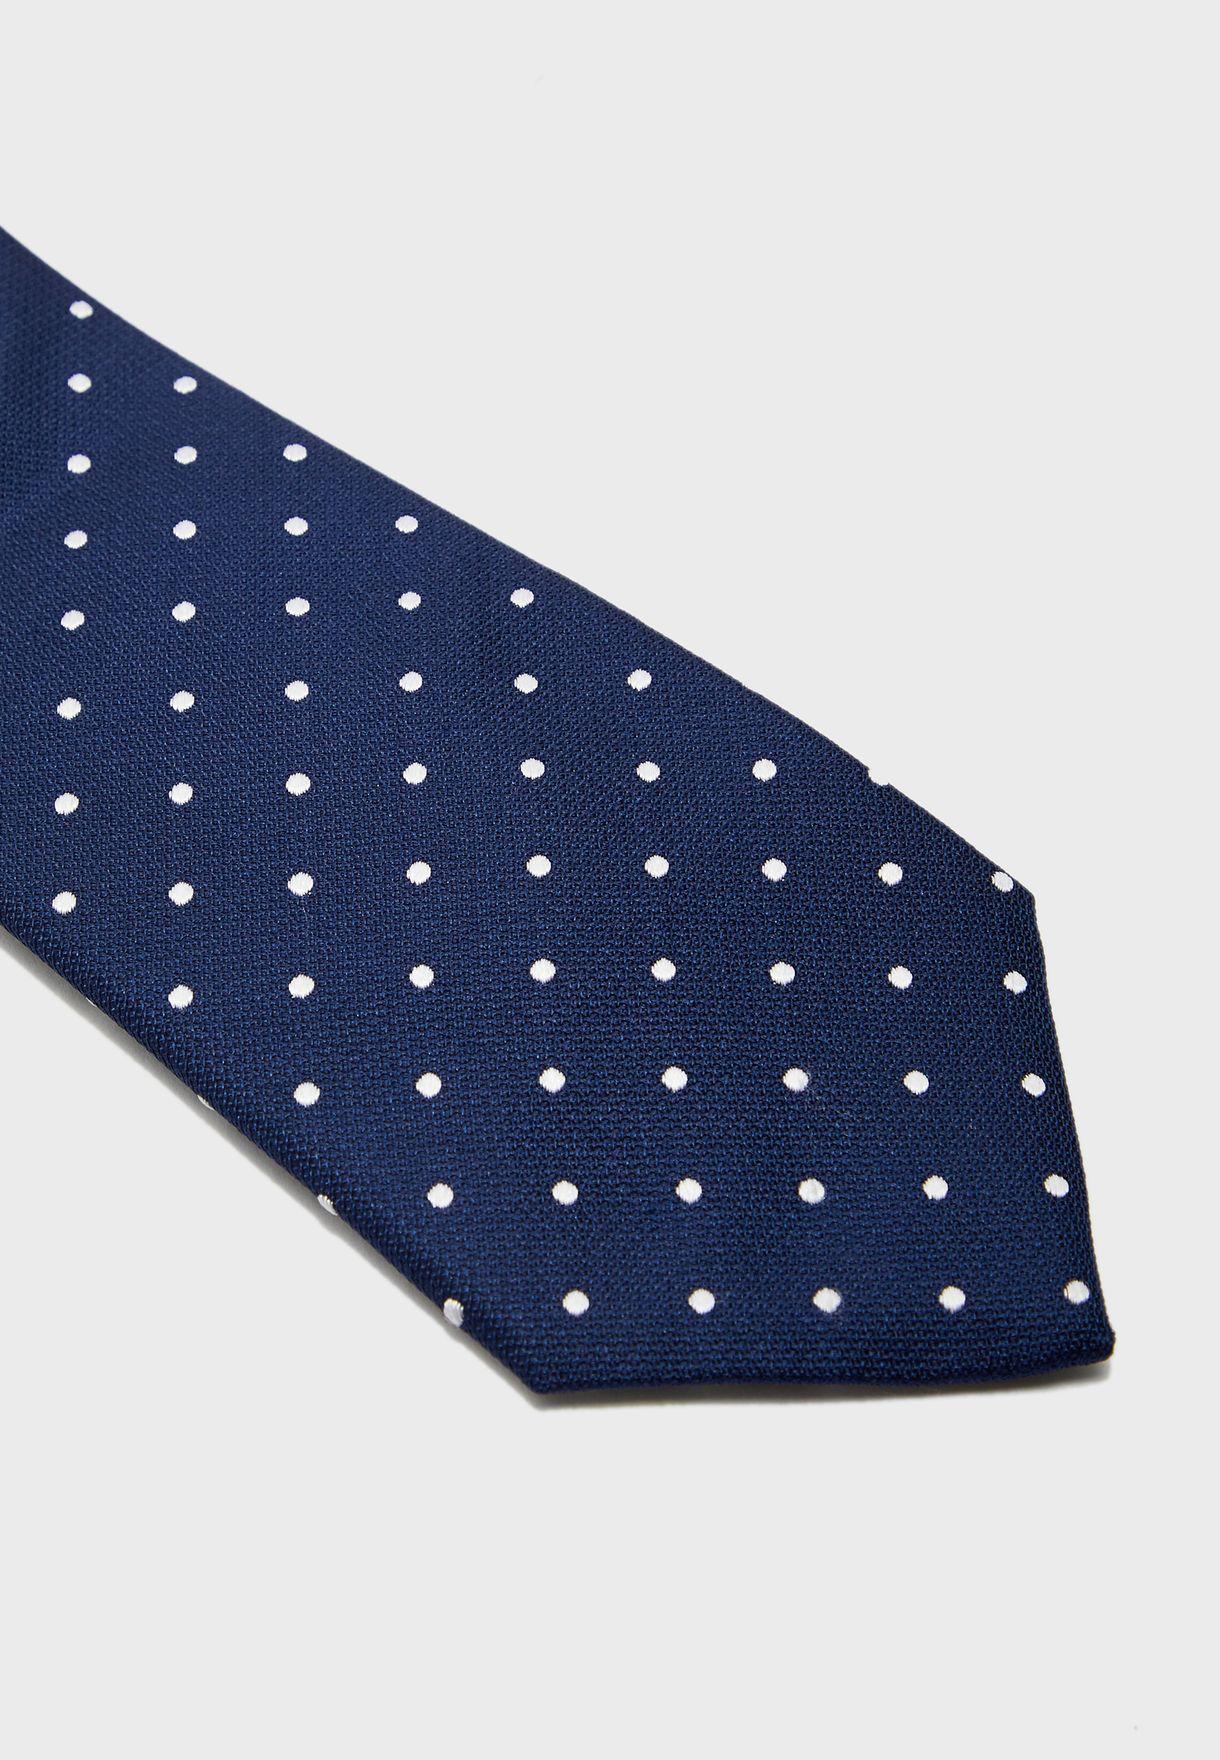 Textured Satin Spot Tie